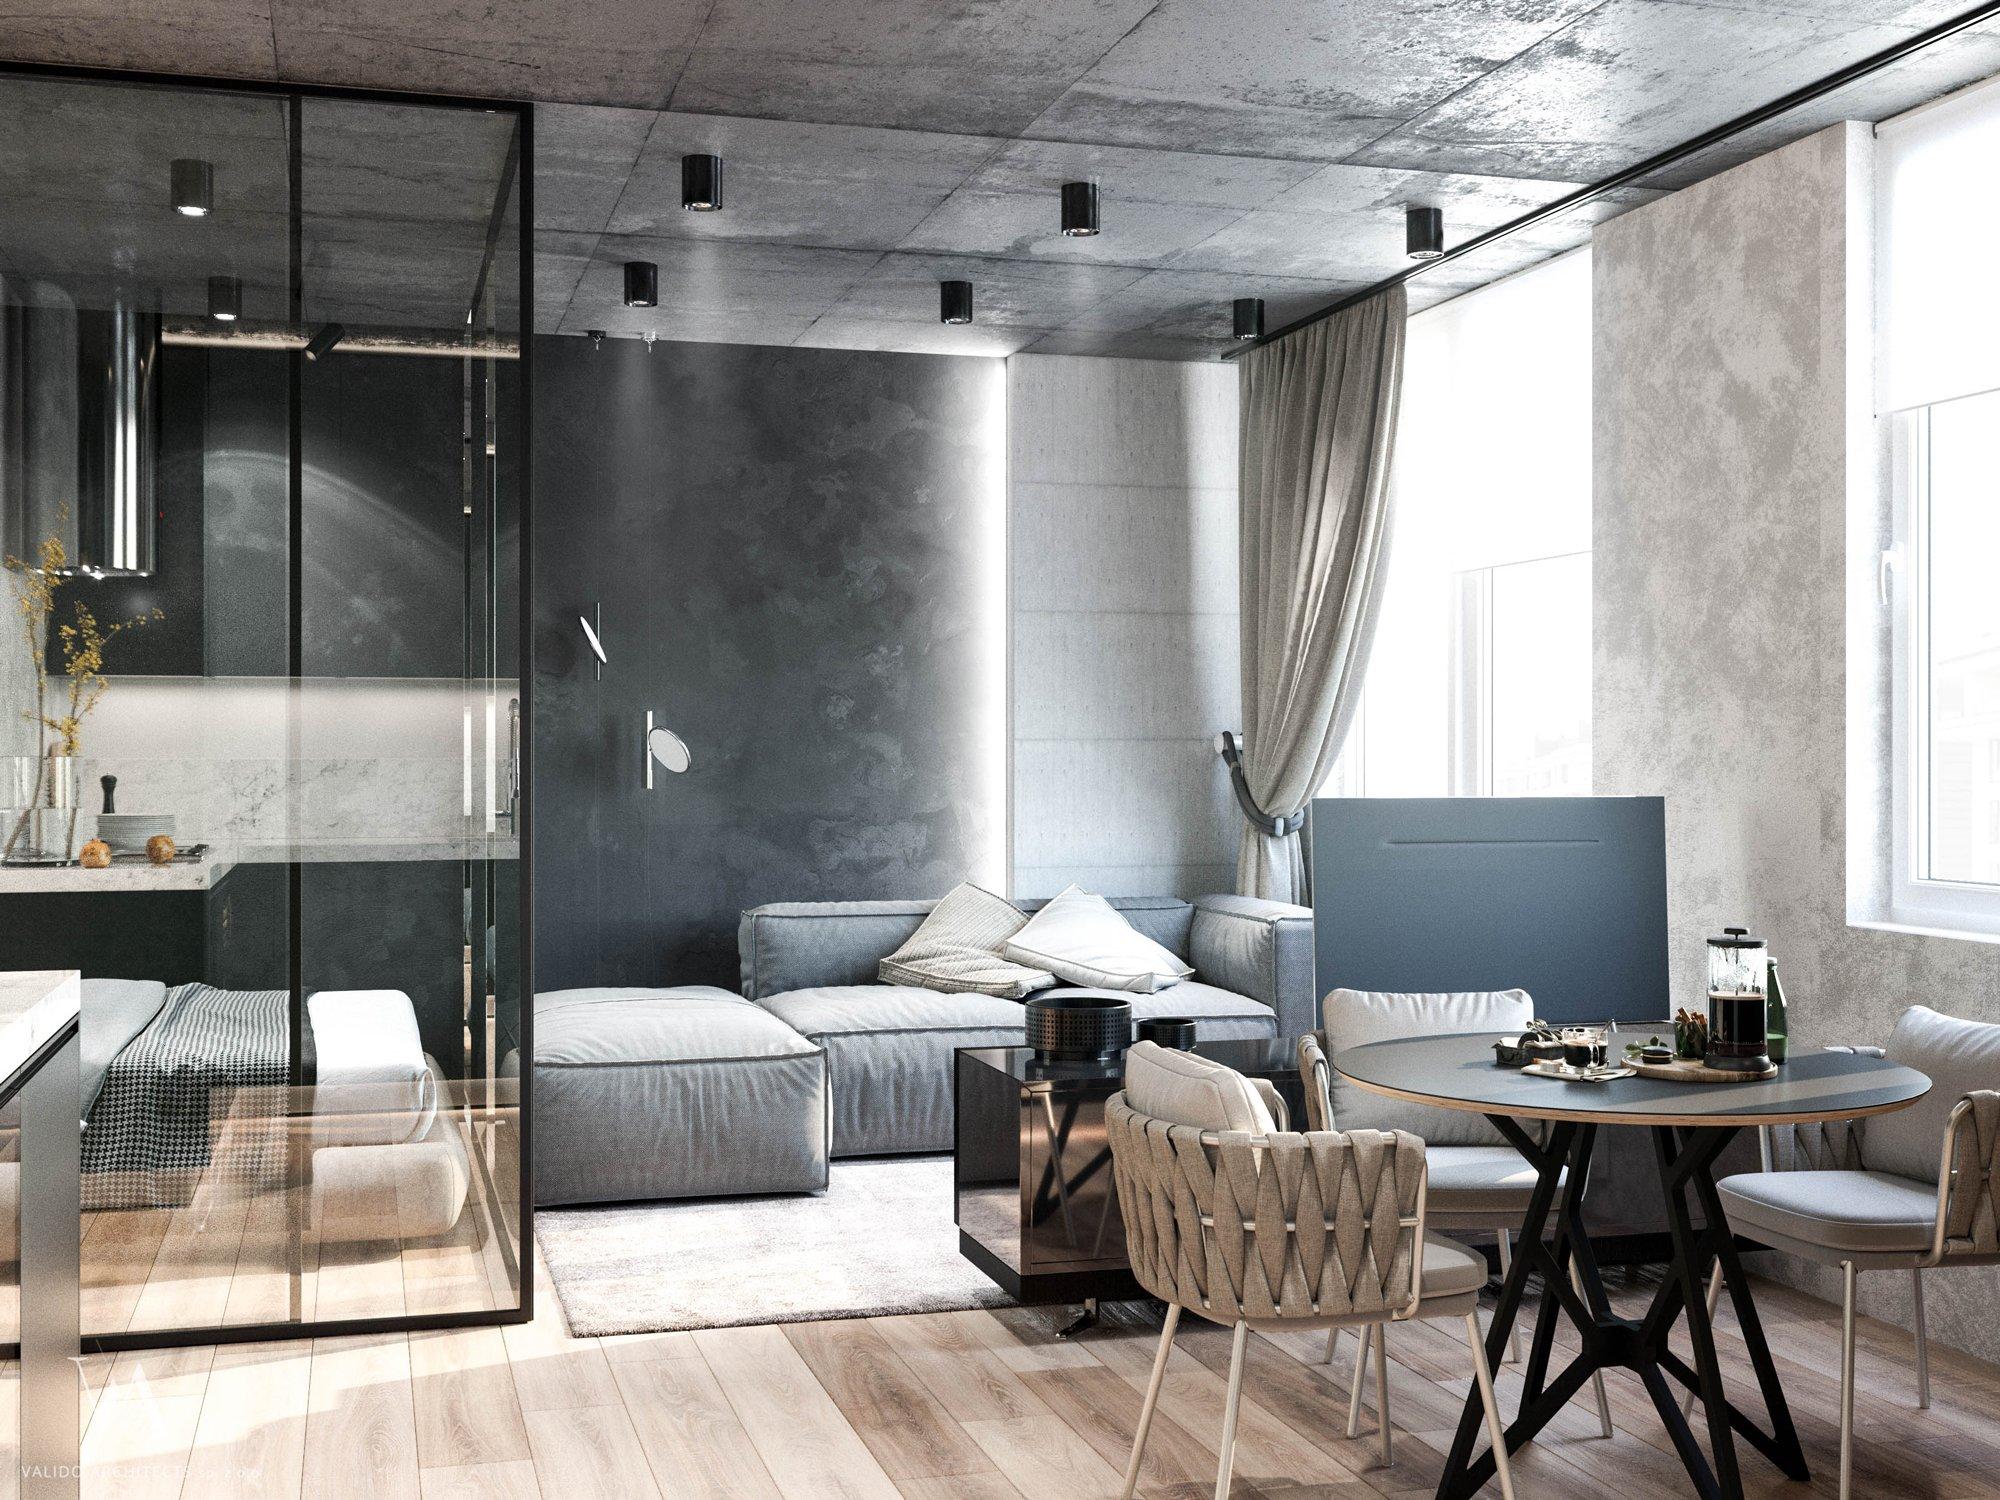 Nowoczesny apartament typu studio